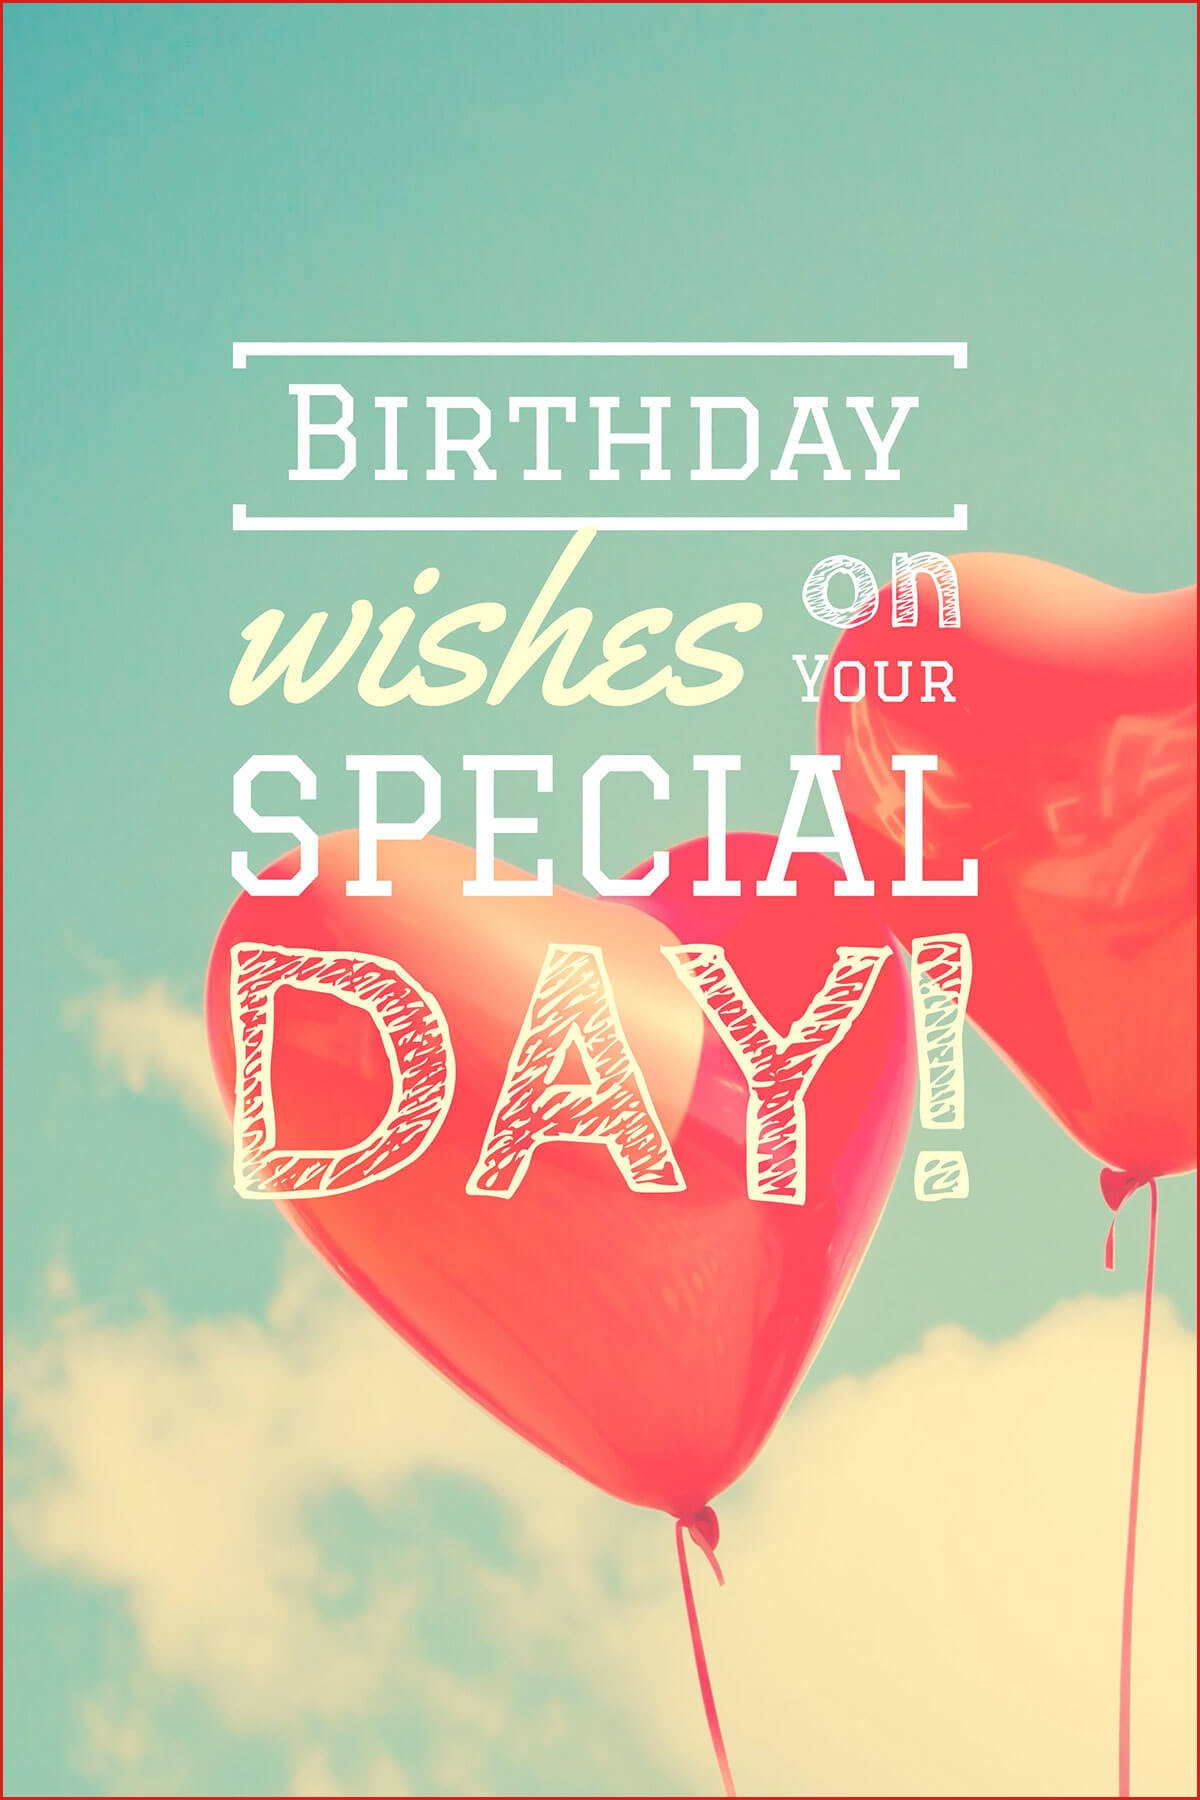 Create Birthday Cards Online Free Printable Birthday Cards Ideas - Card Maker Online Free Printable